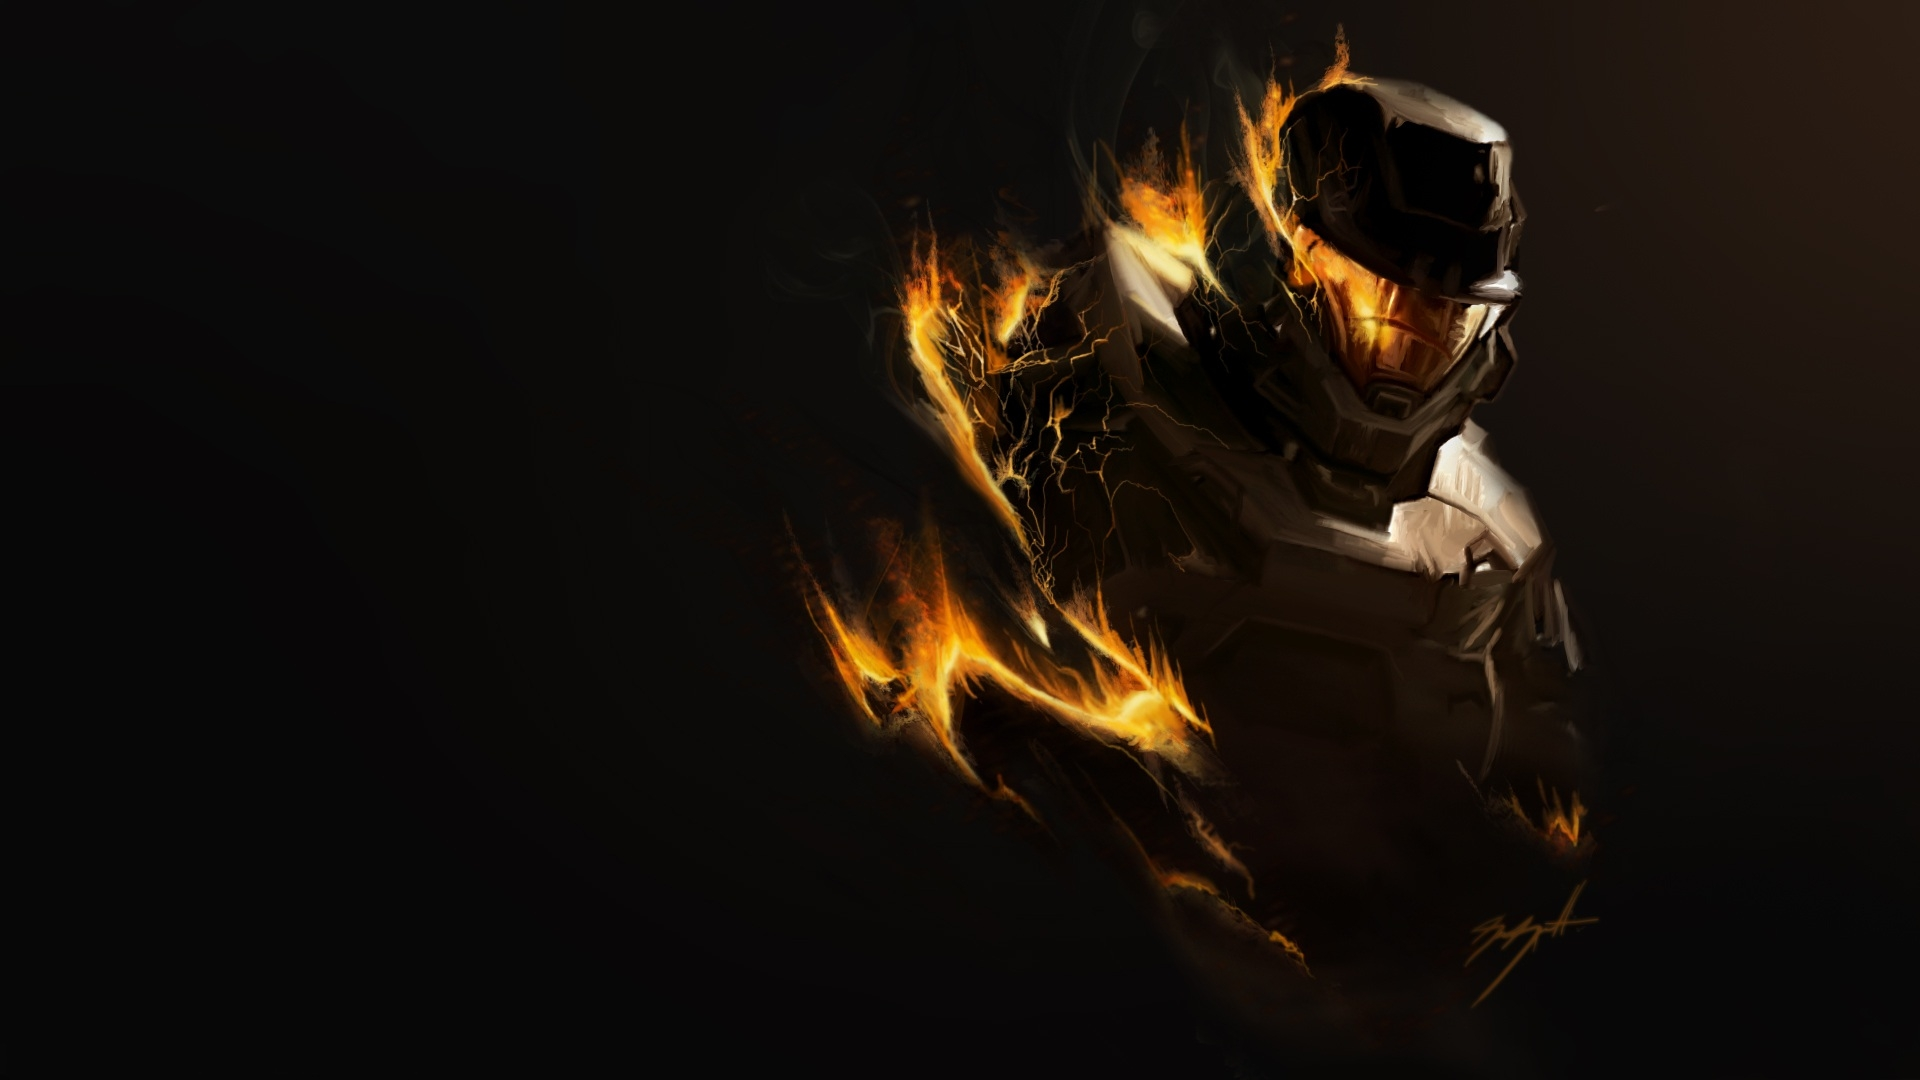 Good Wallpaper Fire Gold - halo_fire_soldier_armor_21924_1920x1080  2018_403310 .jpg